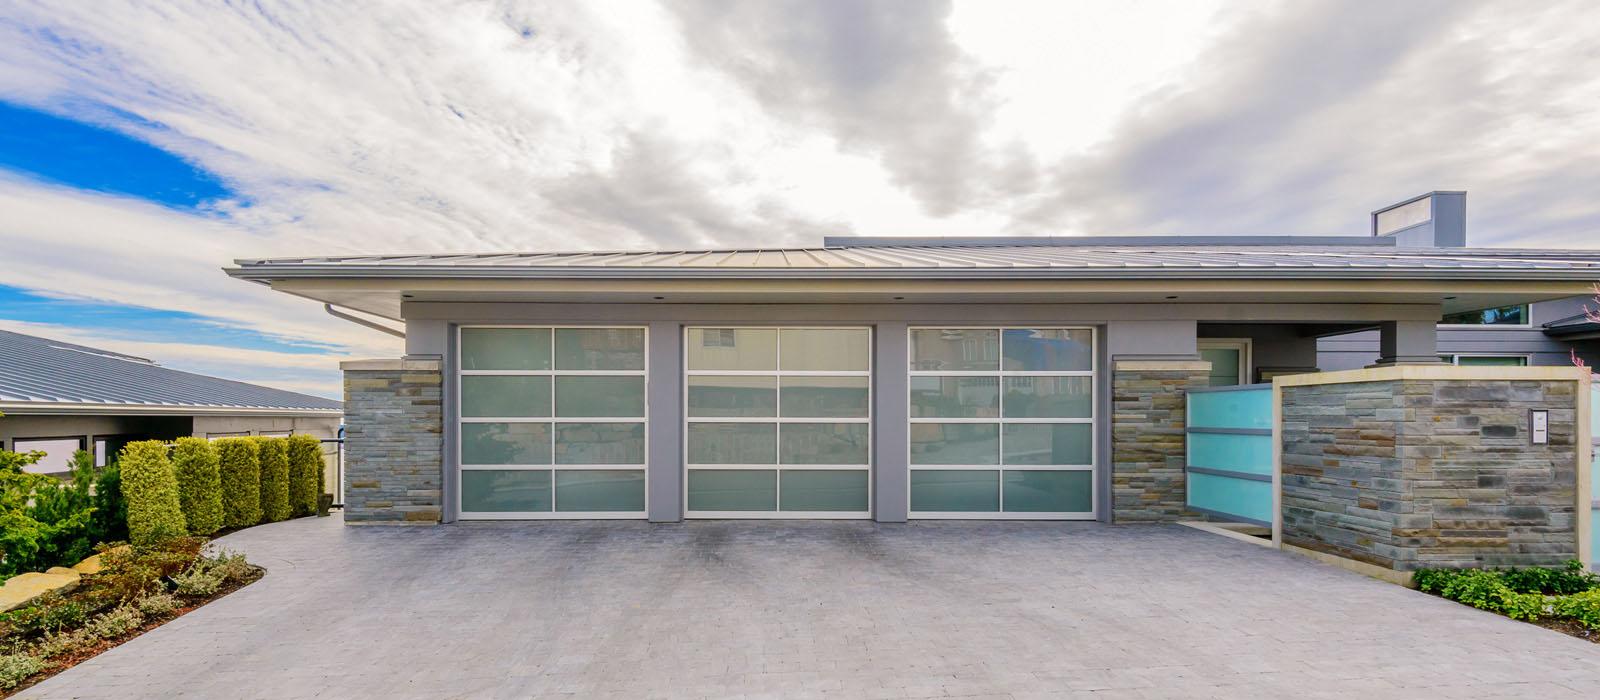 GDR | Garage Door Repair Venice CA (424) 901-0458 | 5* Reviews